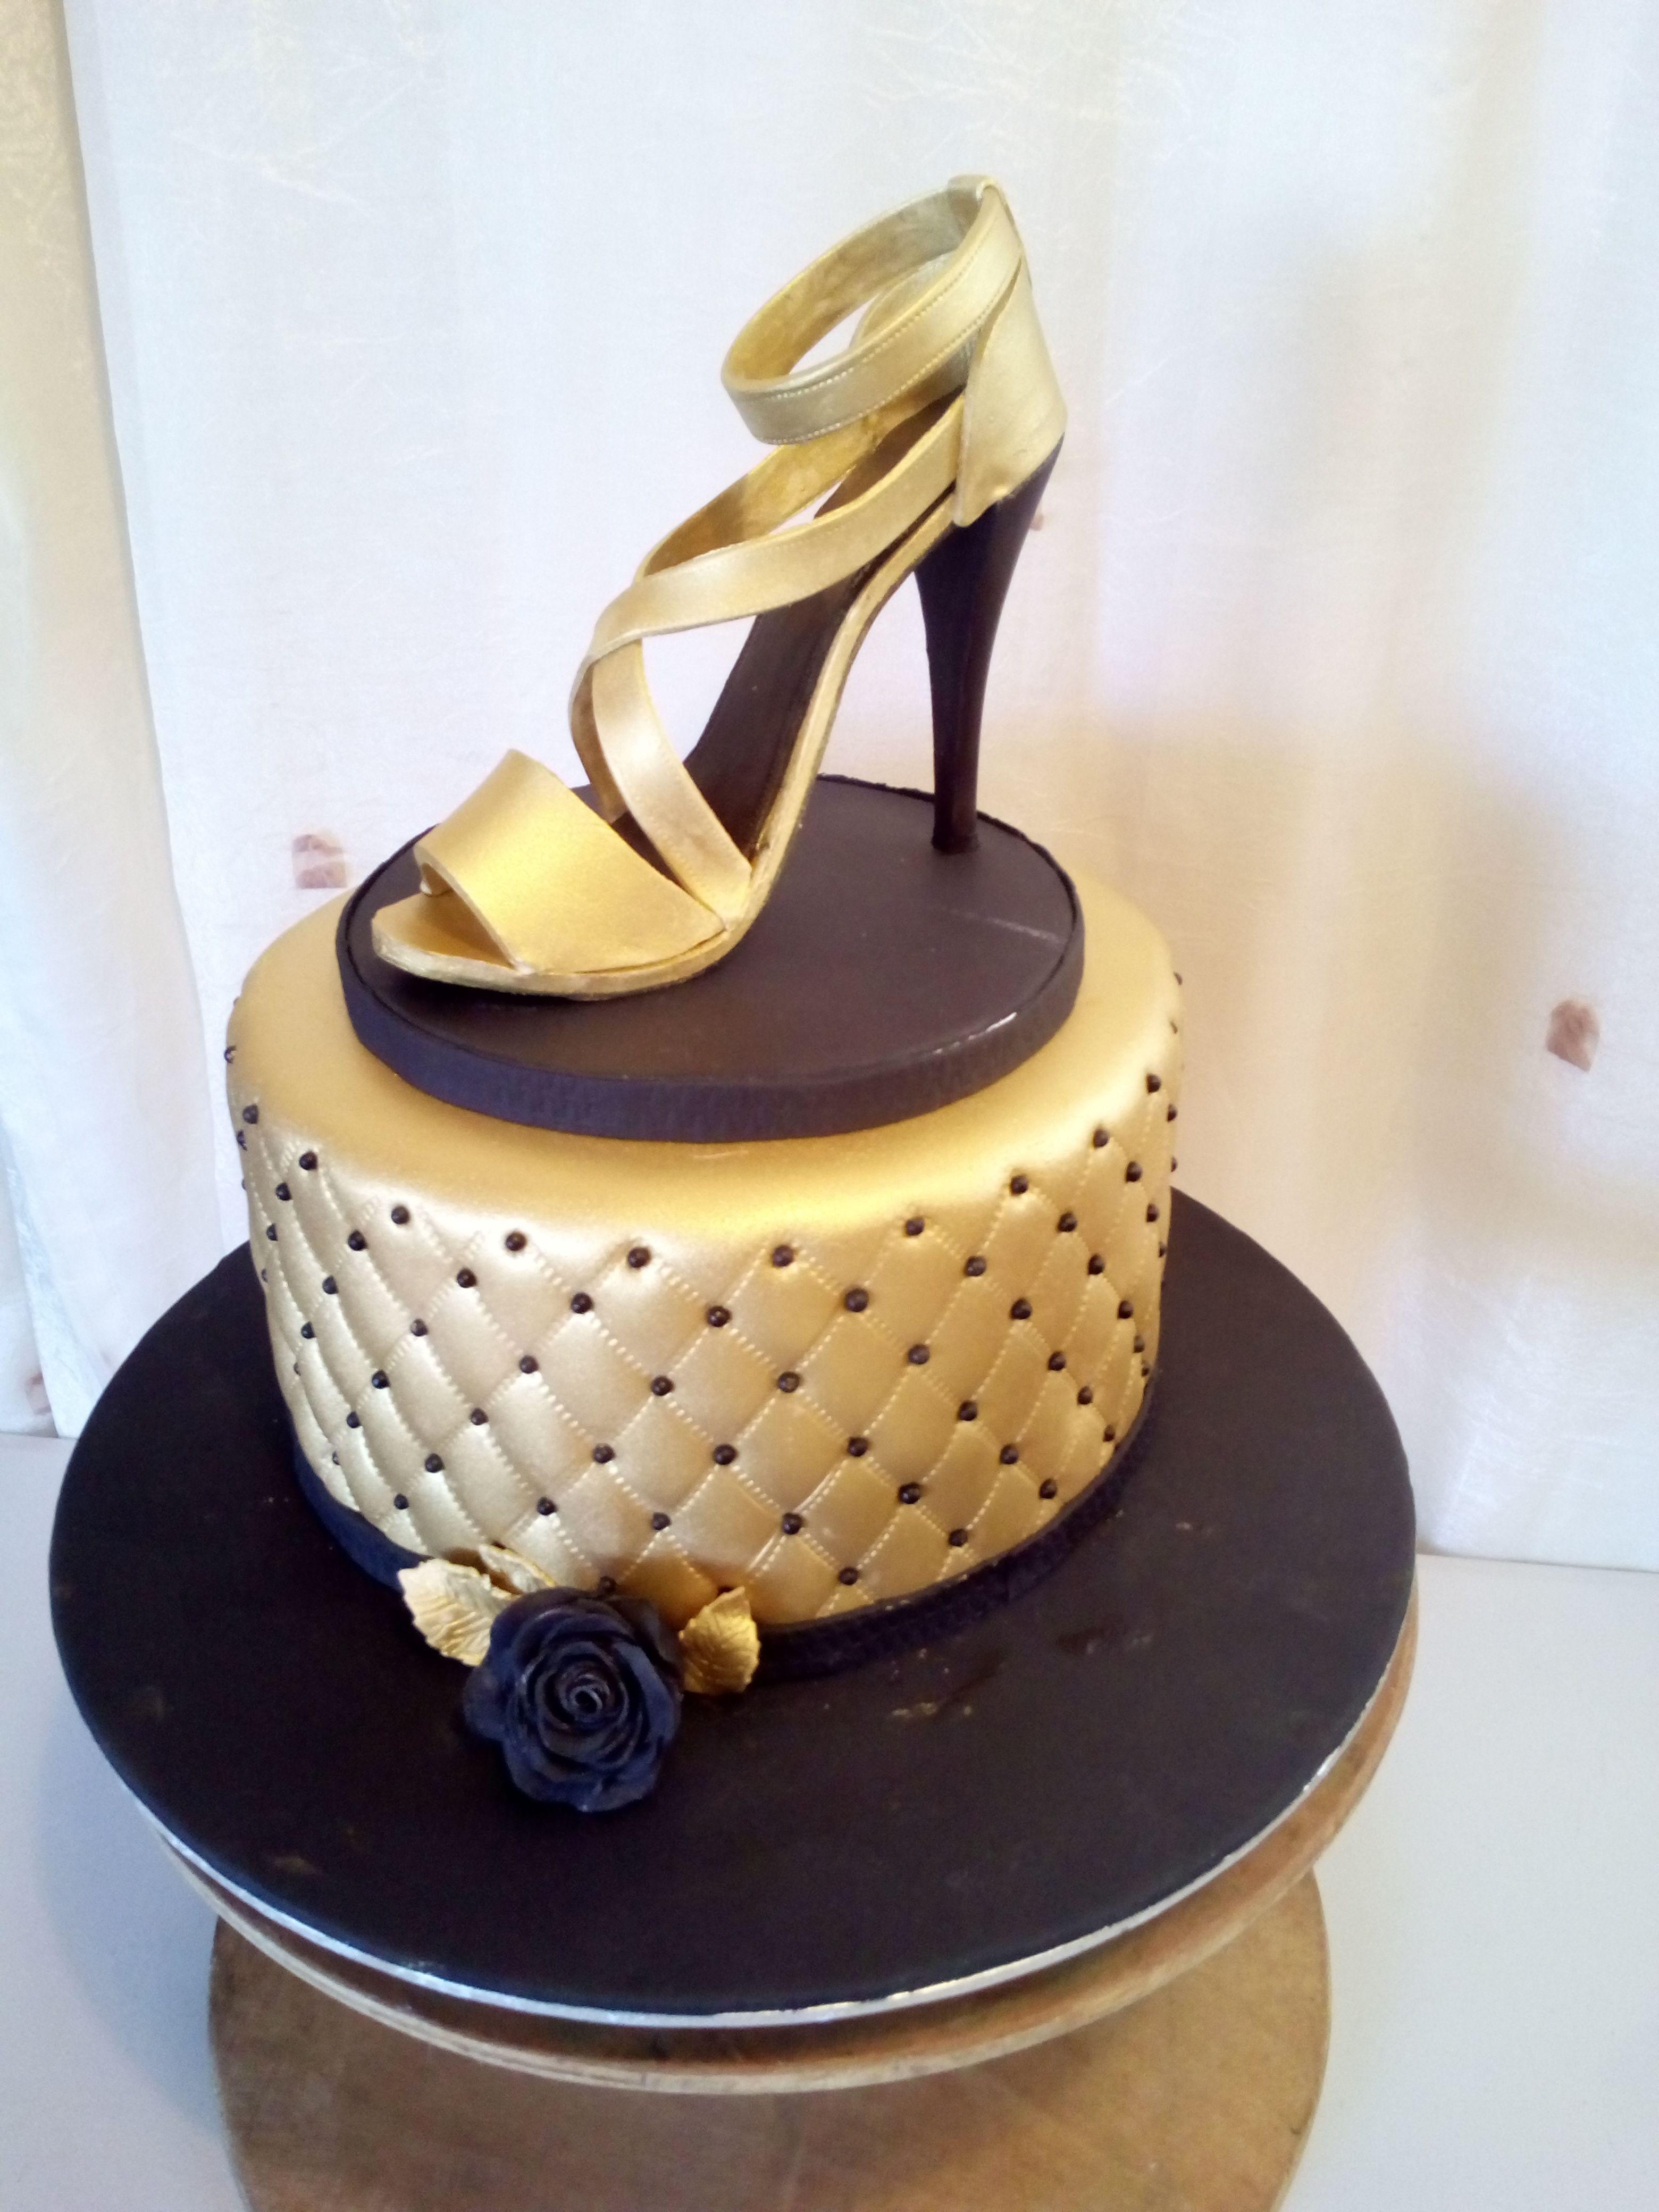 Surprising Gold And Black Stiletto Birthday Cake 50Th Birthday Cake For Funny Birthday Cards Online Kookostrdamsfinfo